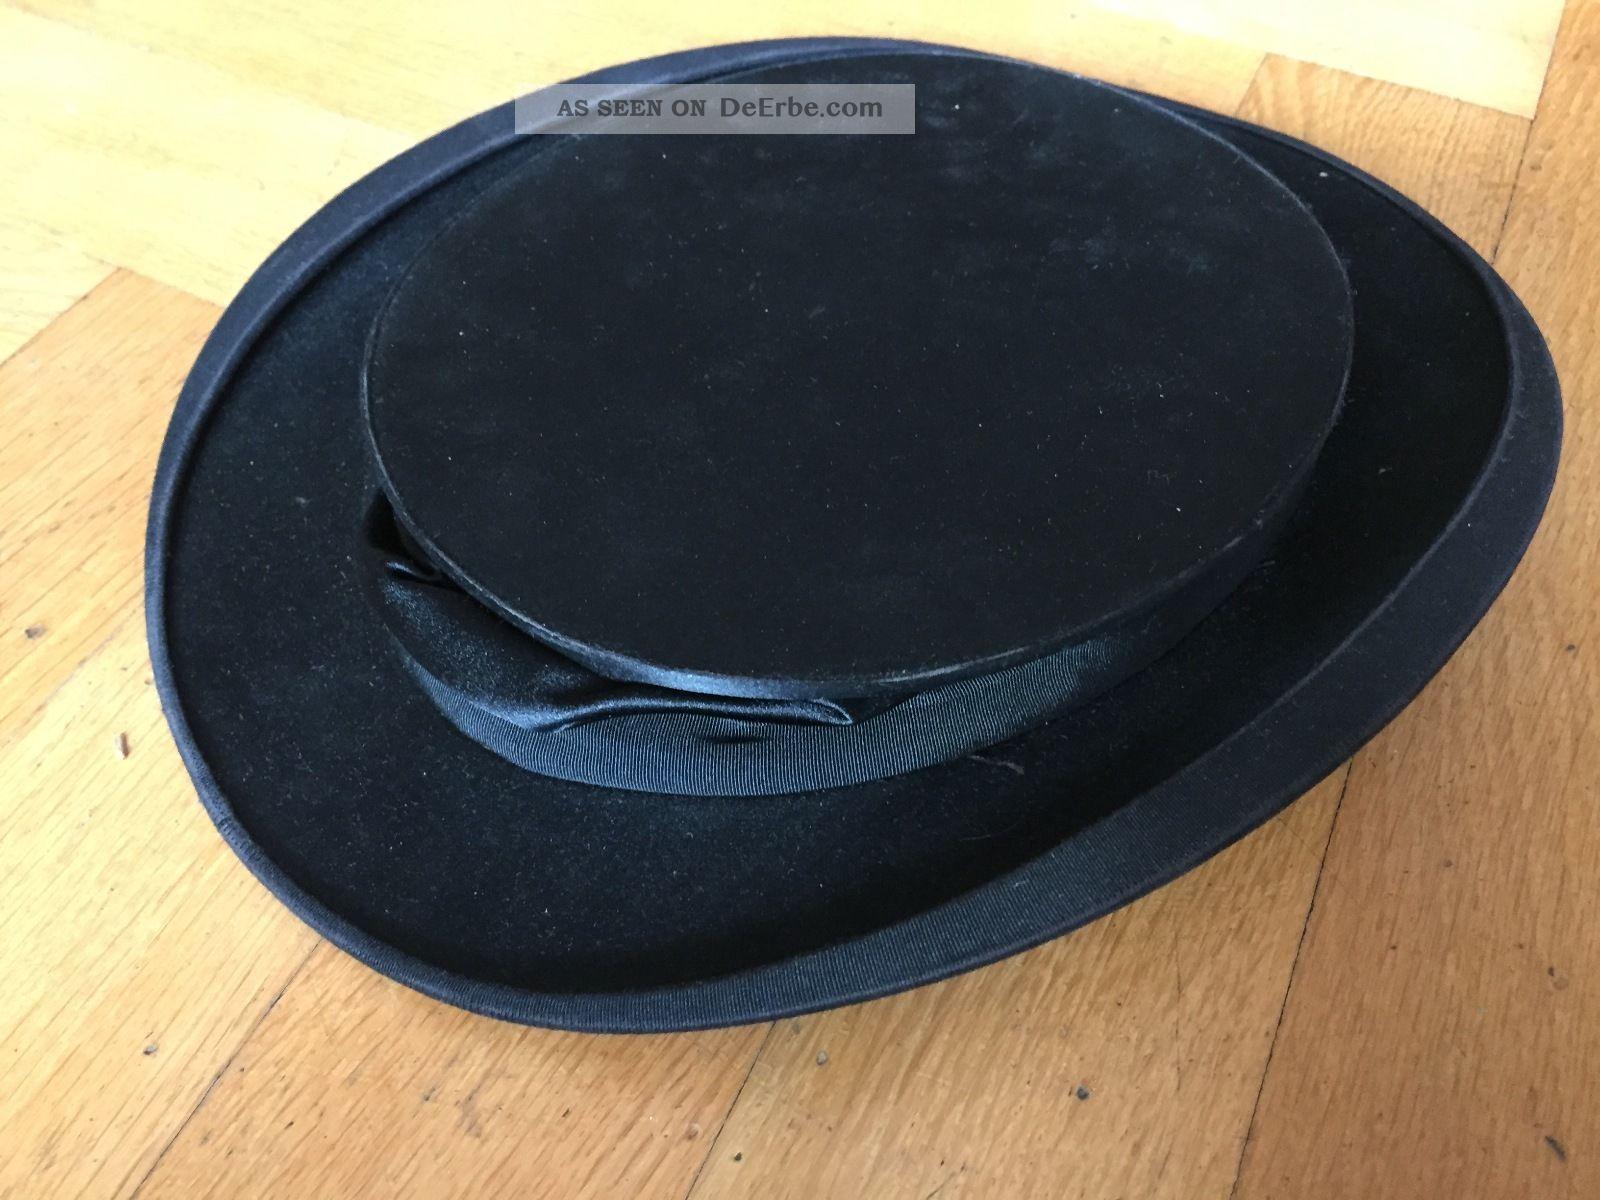 zylinder chapeau claque antik hoflieferant f reuter d sseldorf hut klappbar box. Black Bedroom Furniture Sets. Home Design Ideas